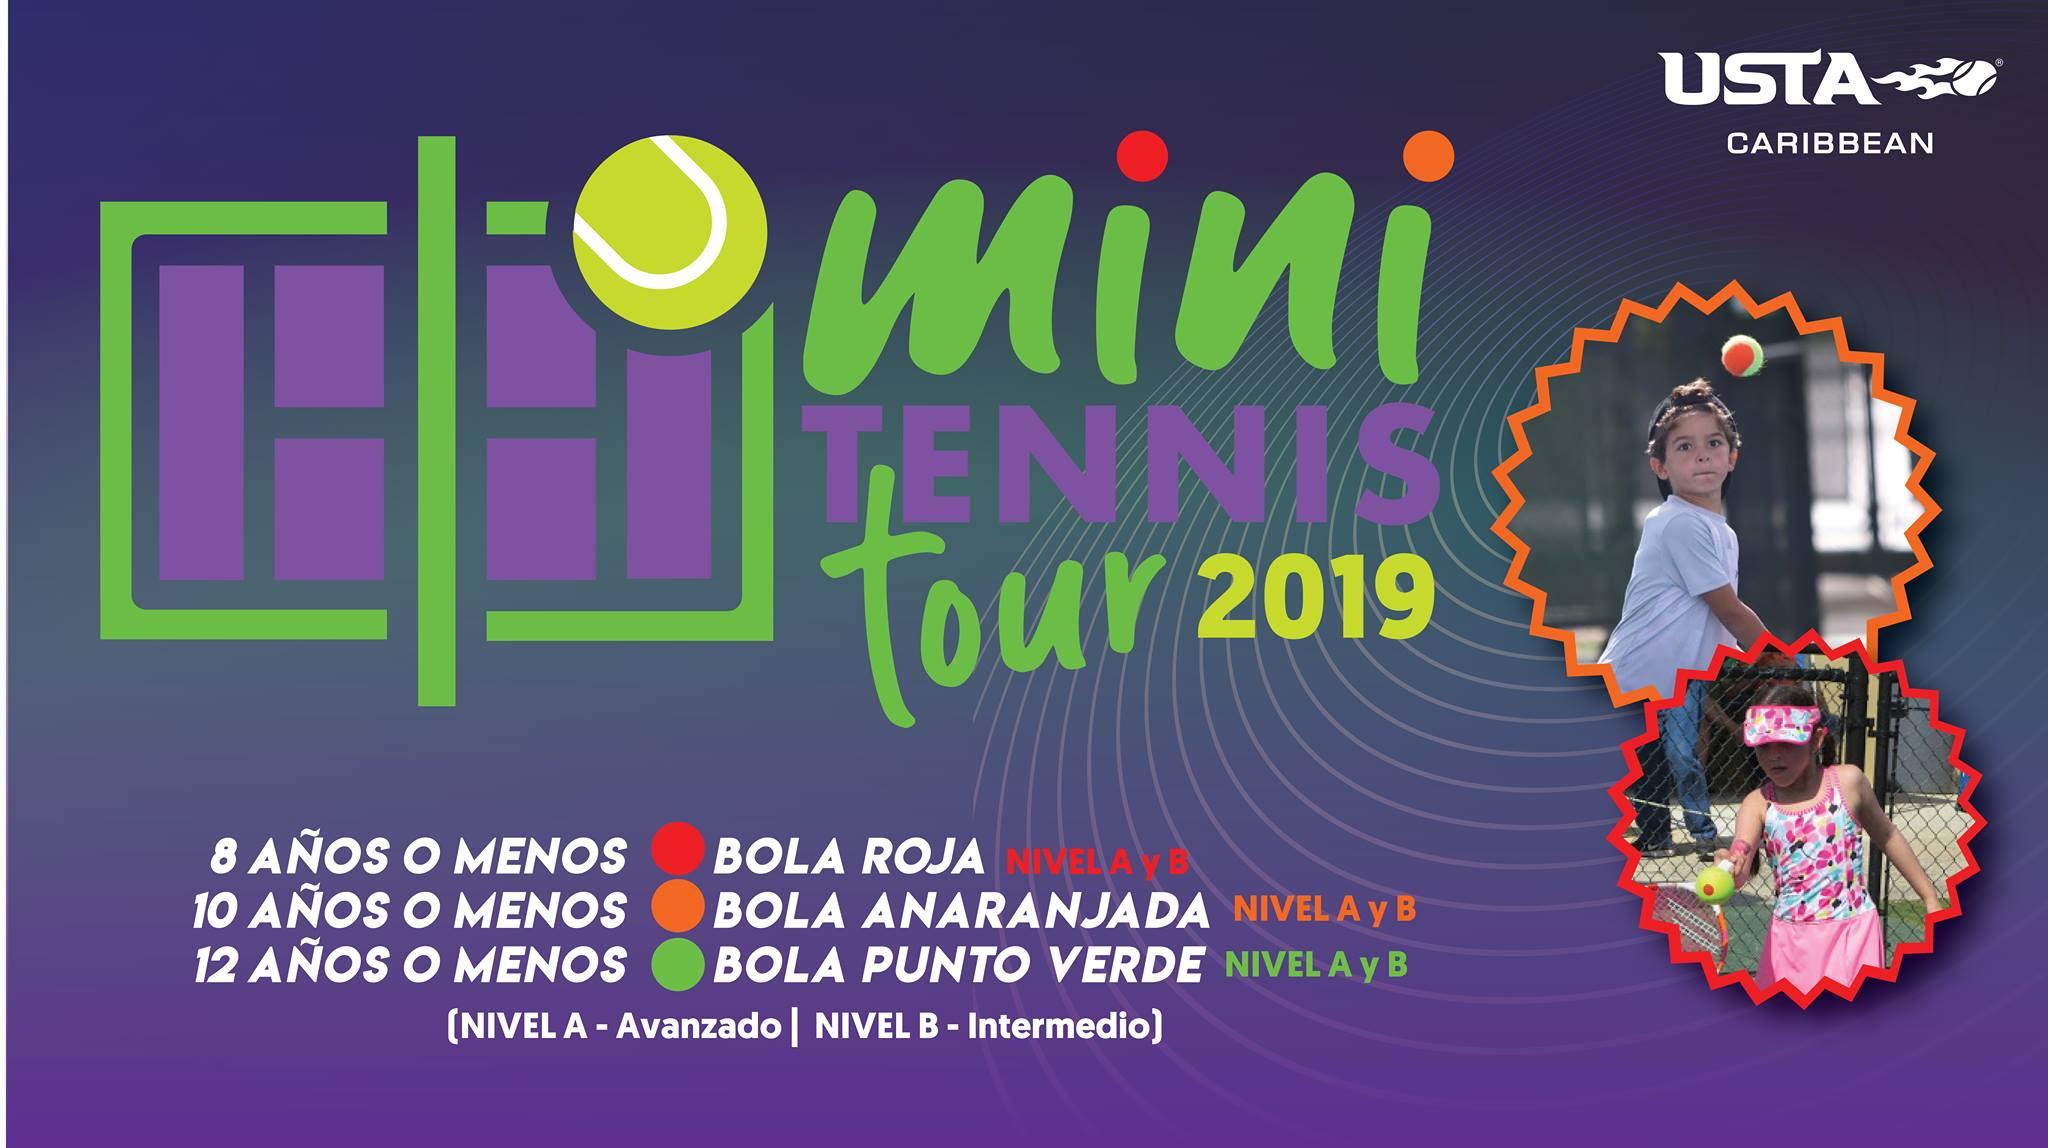 Mini Tenis en el Centro de Tenis Honda del 23 al 24 de febrero de 2019